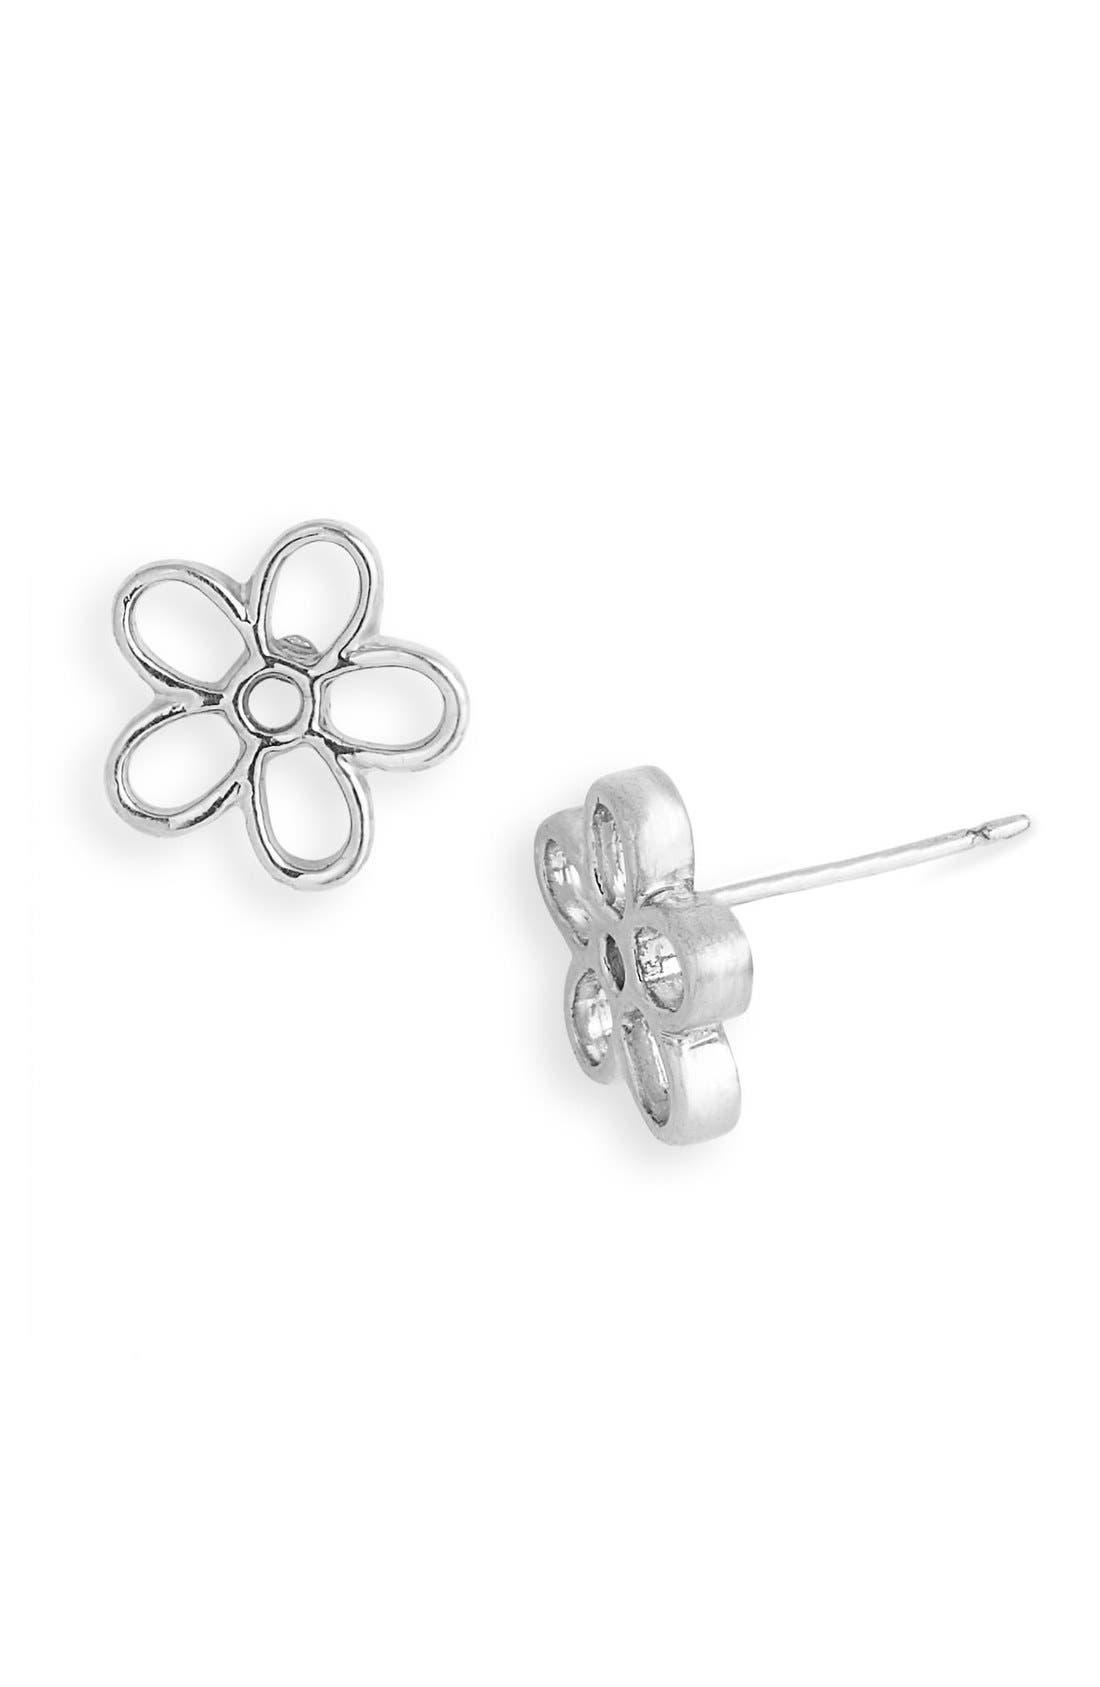 Daisy Stud Earrings,                             Main thumbnail 1, color,                             041